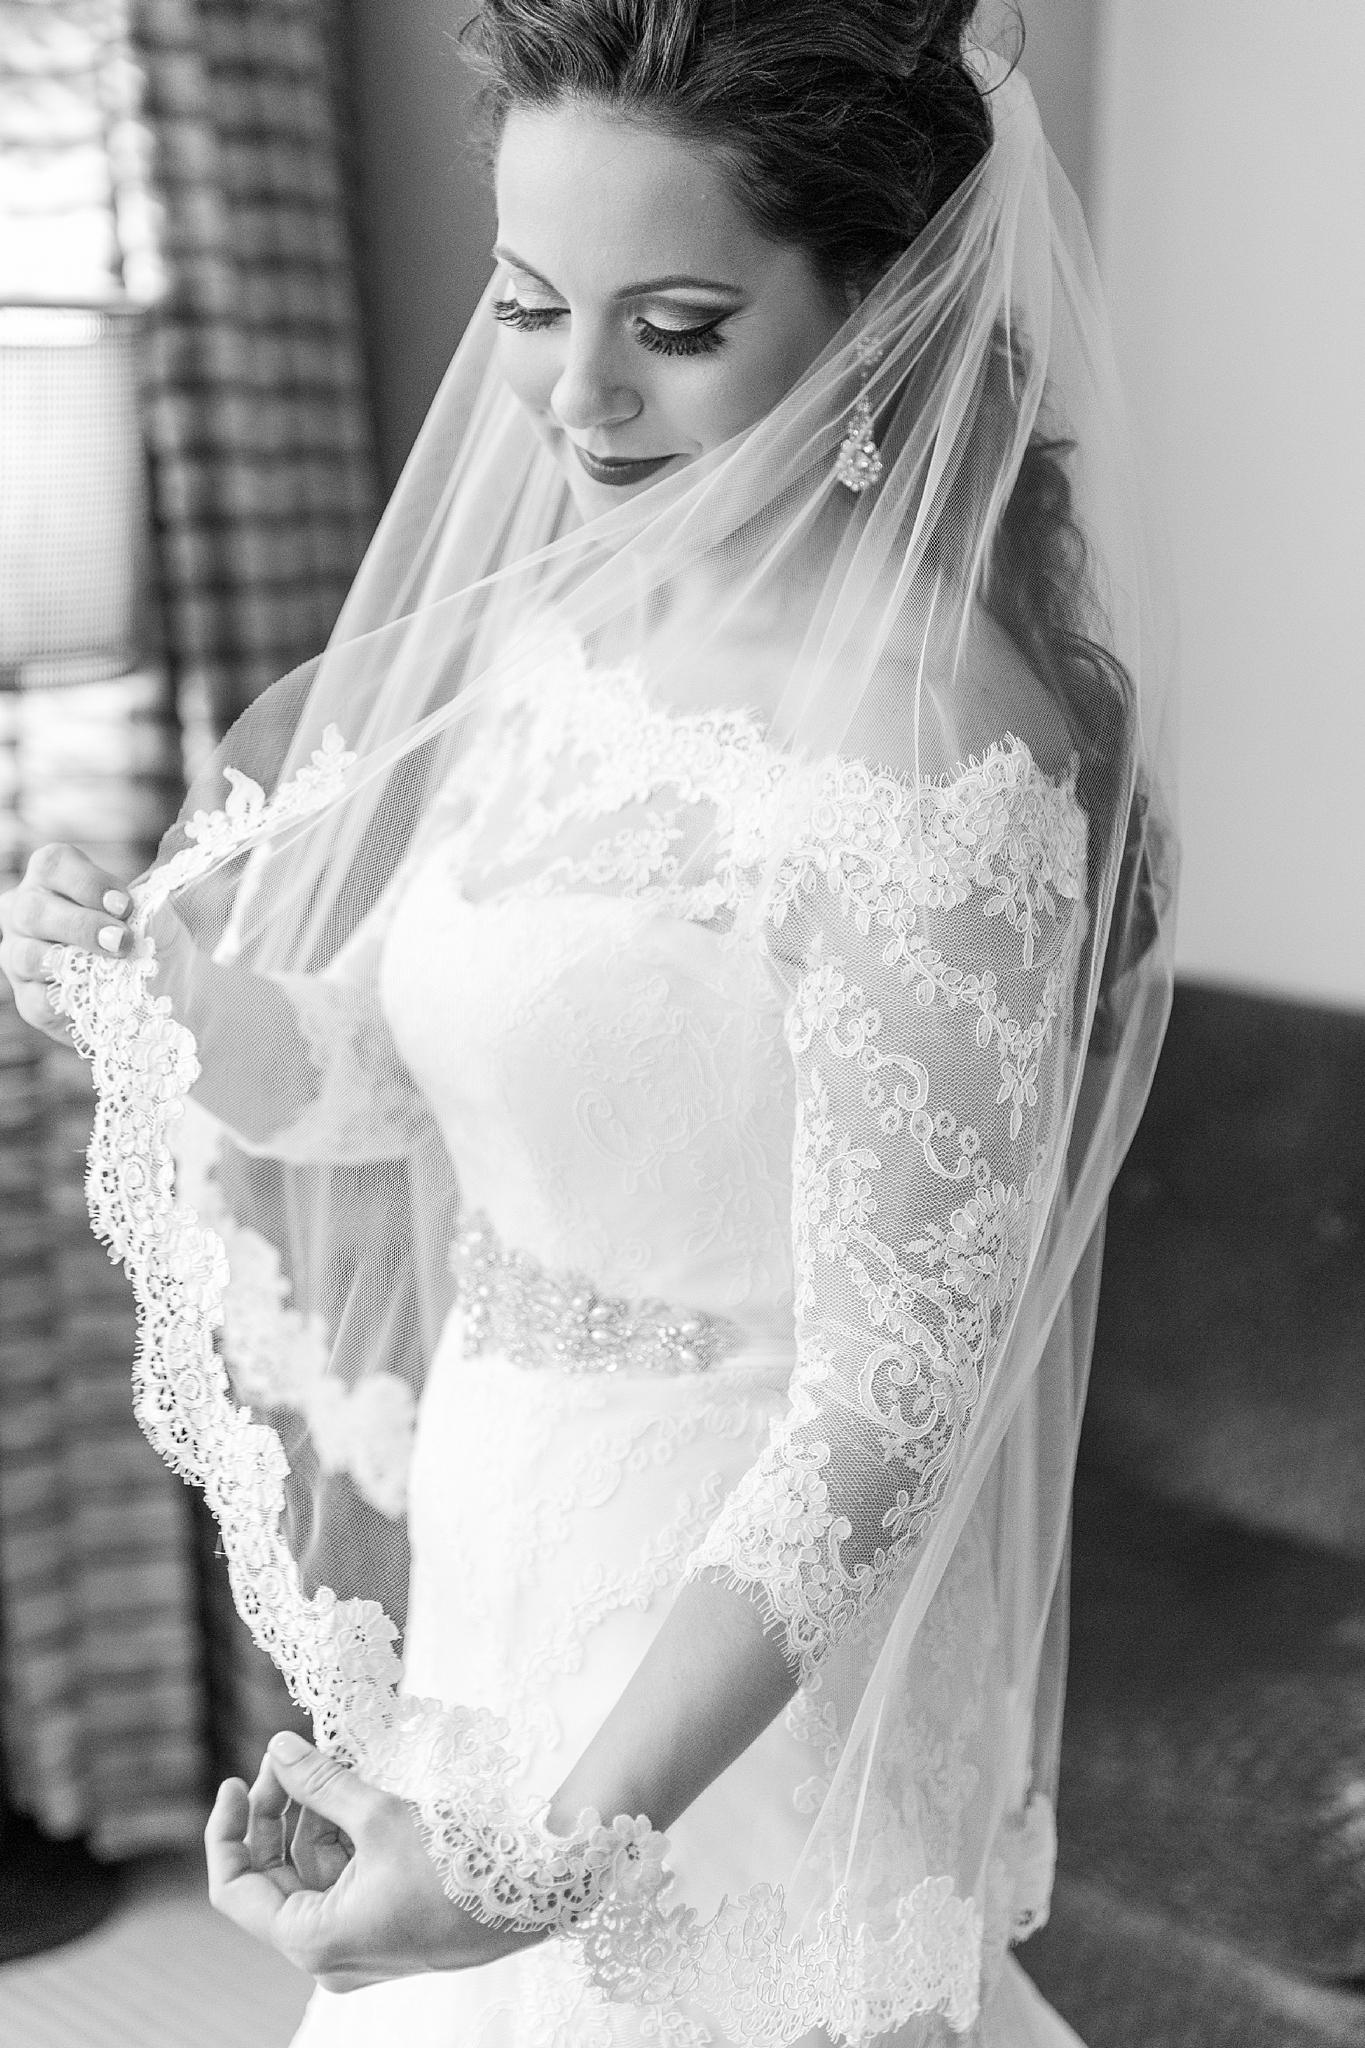 detroit-colony-club-wedding-regal-romantic-photography-in-detroit-mi-by-courtney-carolyn-photography_0005.jpg